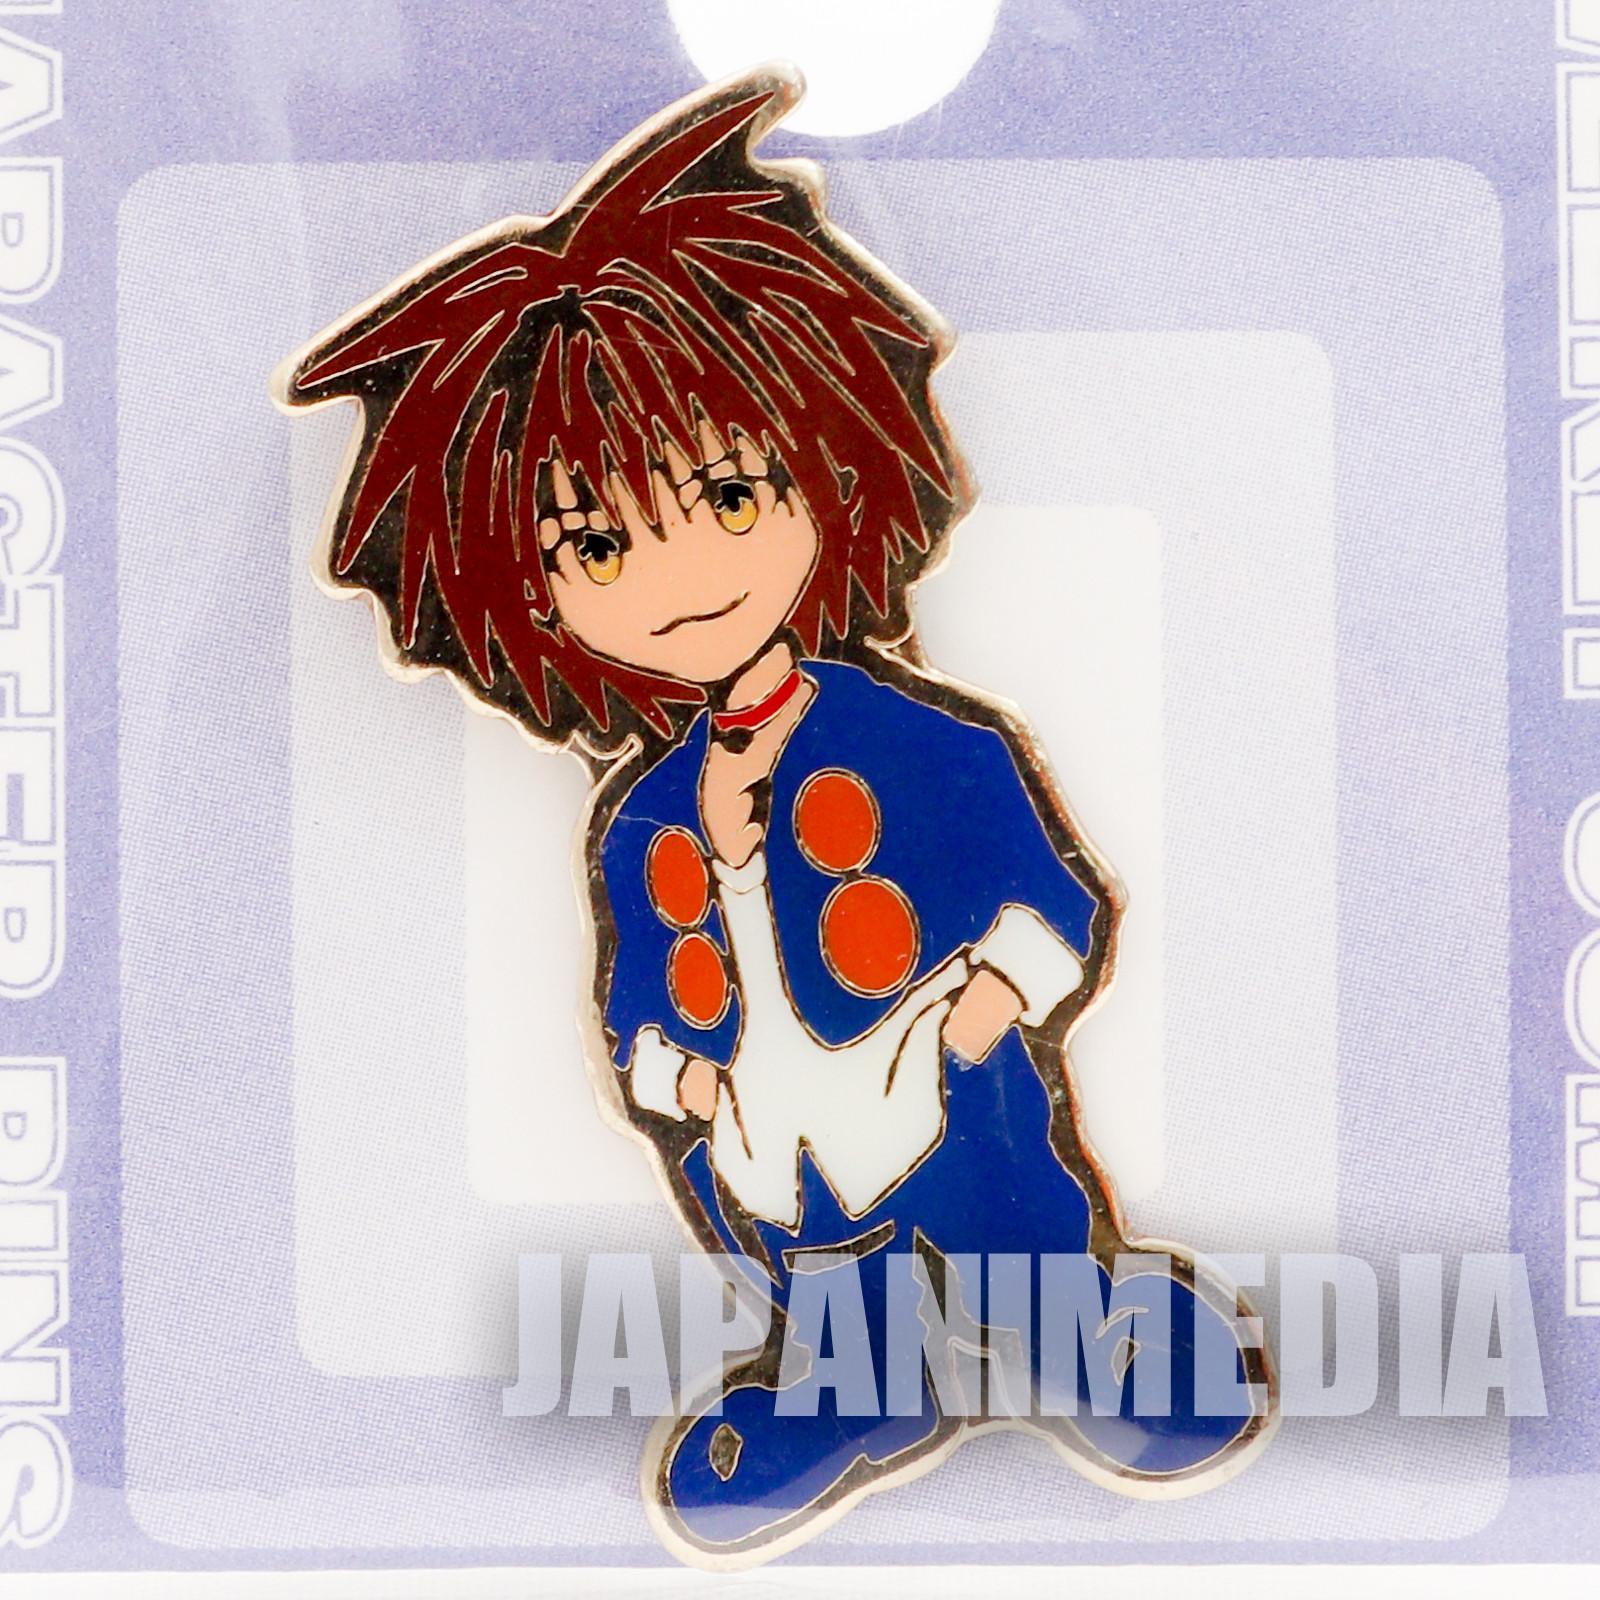 Black Cat Train Heartnet Character Pins JAPAN ANIME SHONEN JUMP